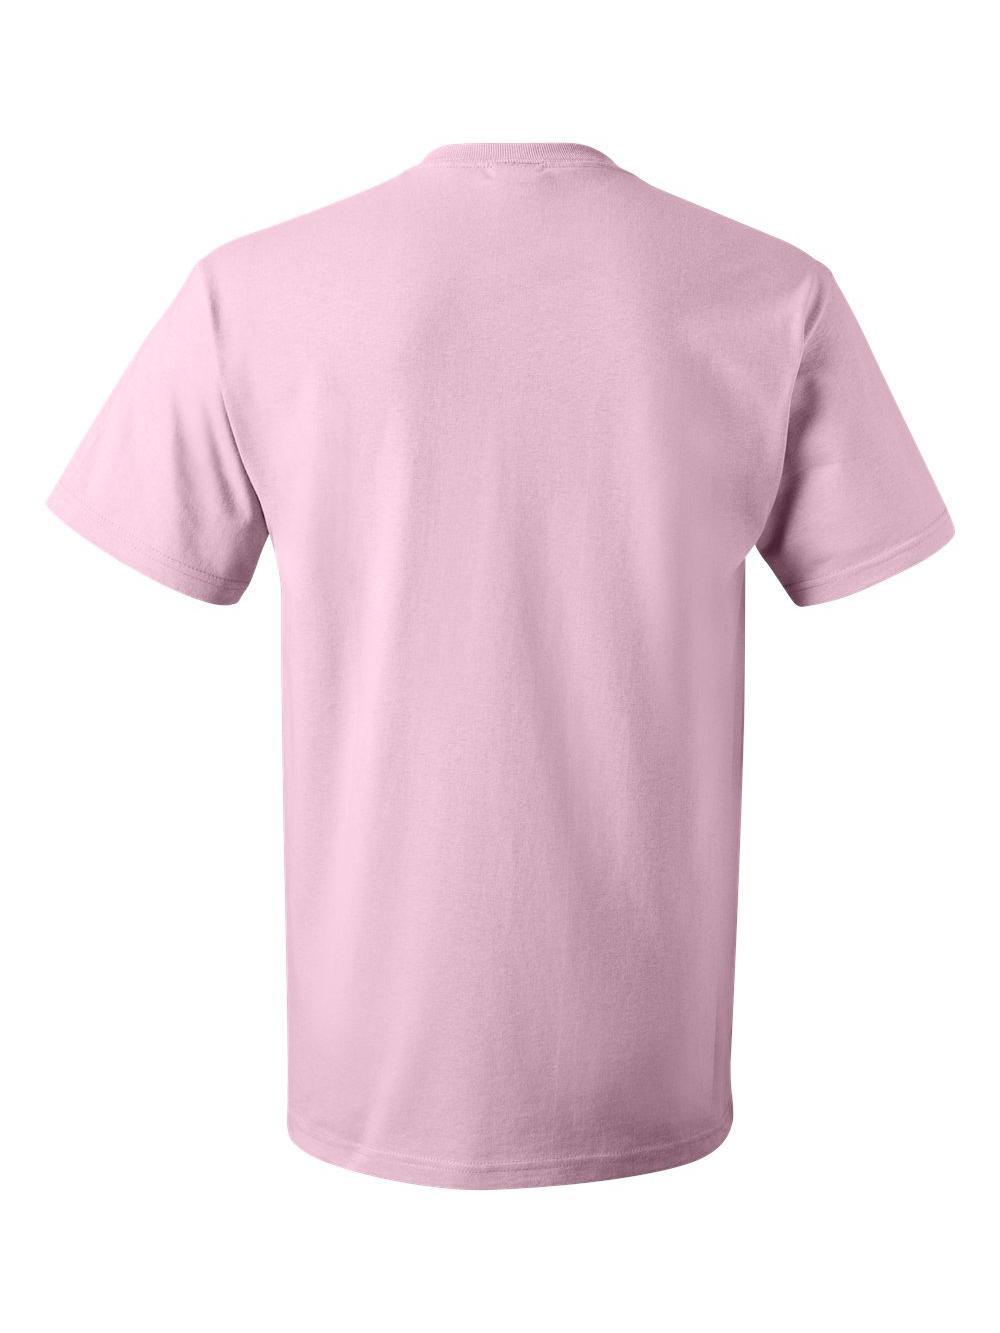 Fruit-of-the-Loom-HD-Cotton-Short-Sleeve-T-Shirt-3930R thumbnail 31